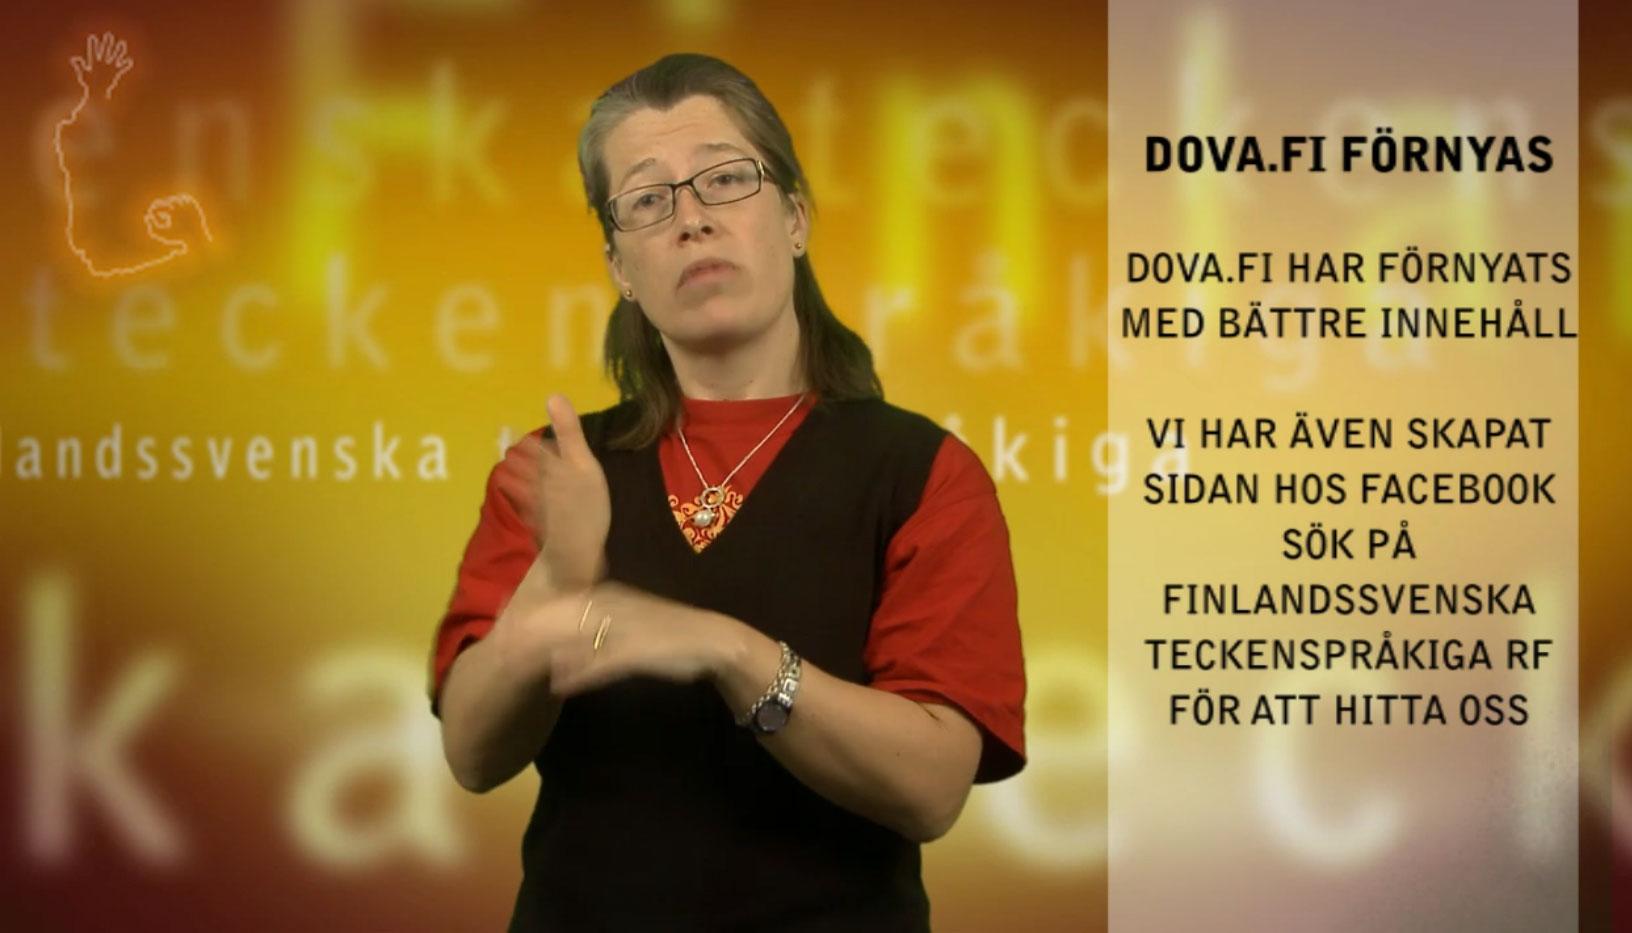 Nyheter 07/2011